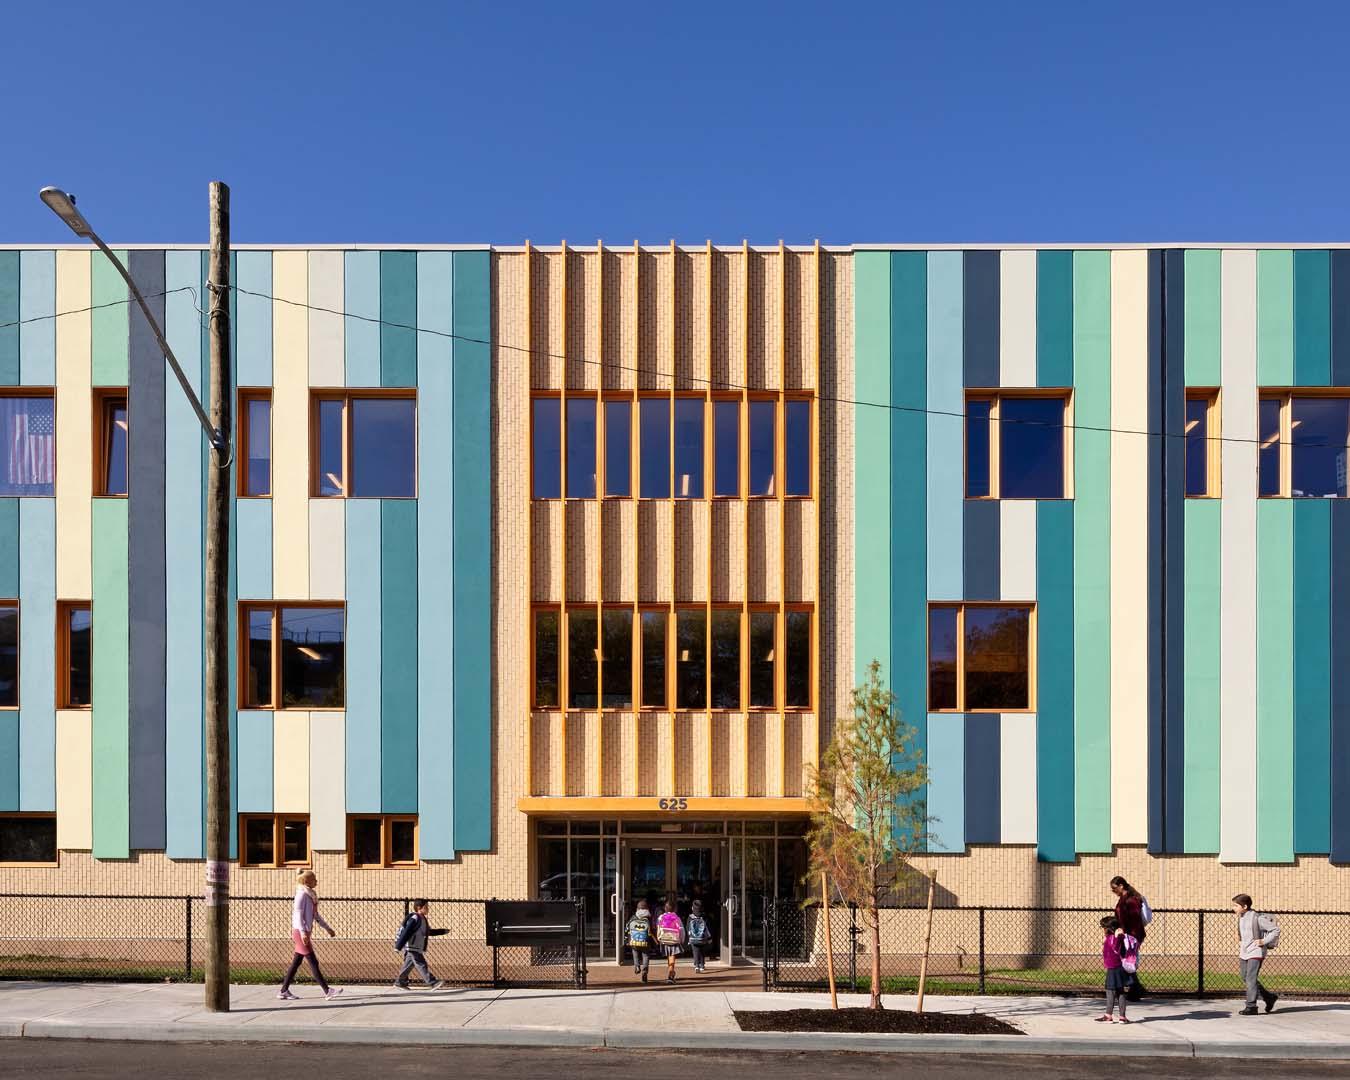 Grand Concourse Academy Charter School